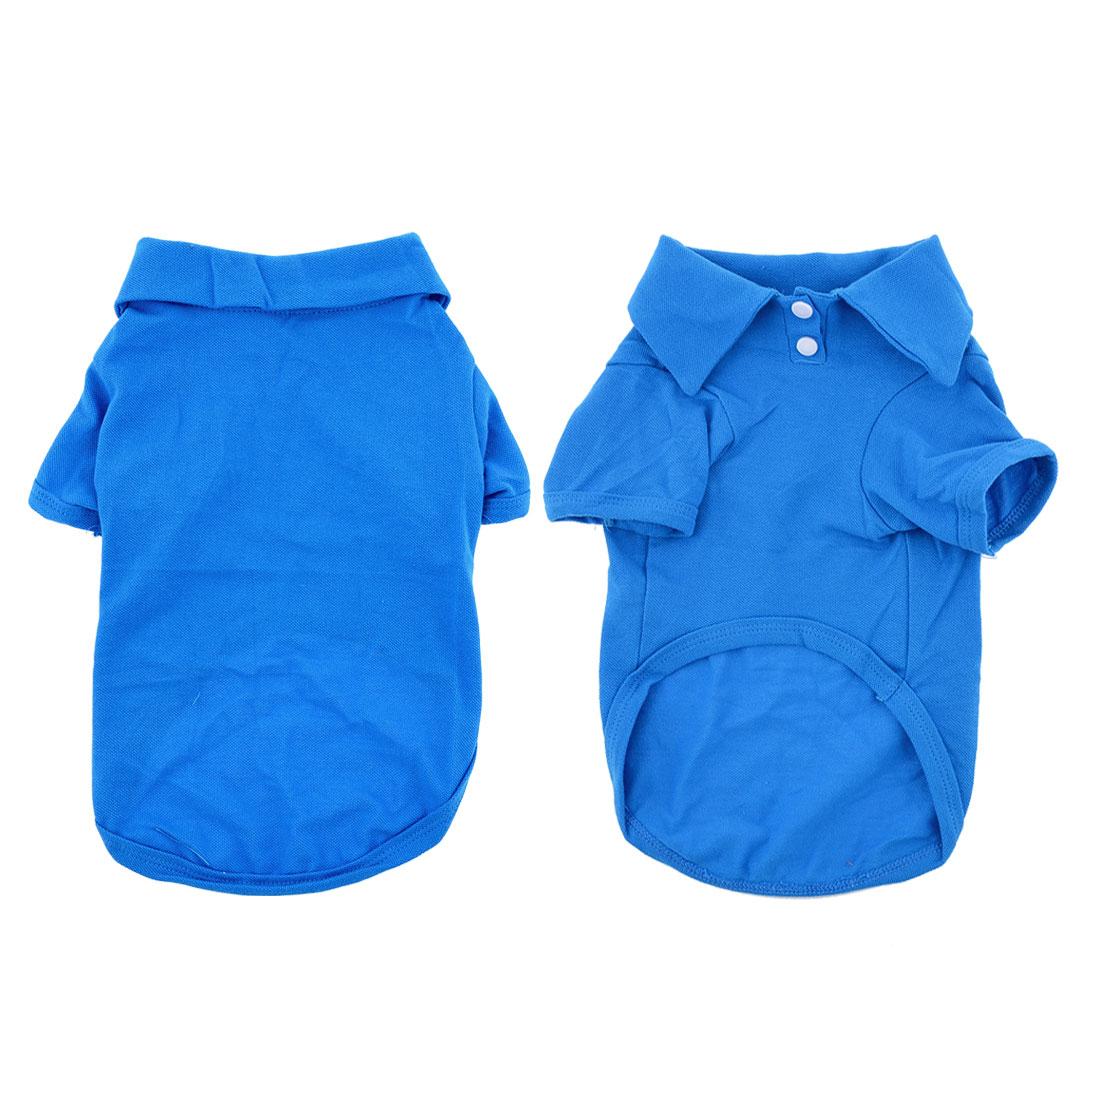 Doggy Dog Pet Clothing Summer Short Sleeves Shirt Royal Blue M